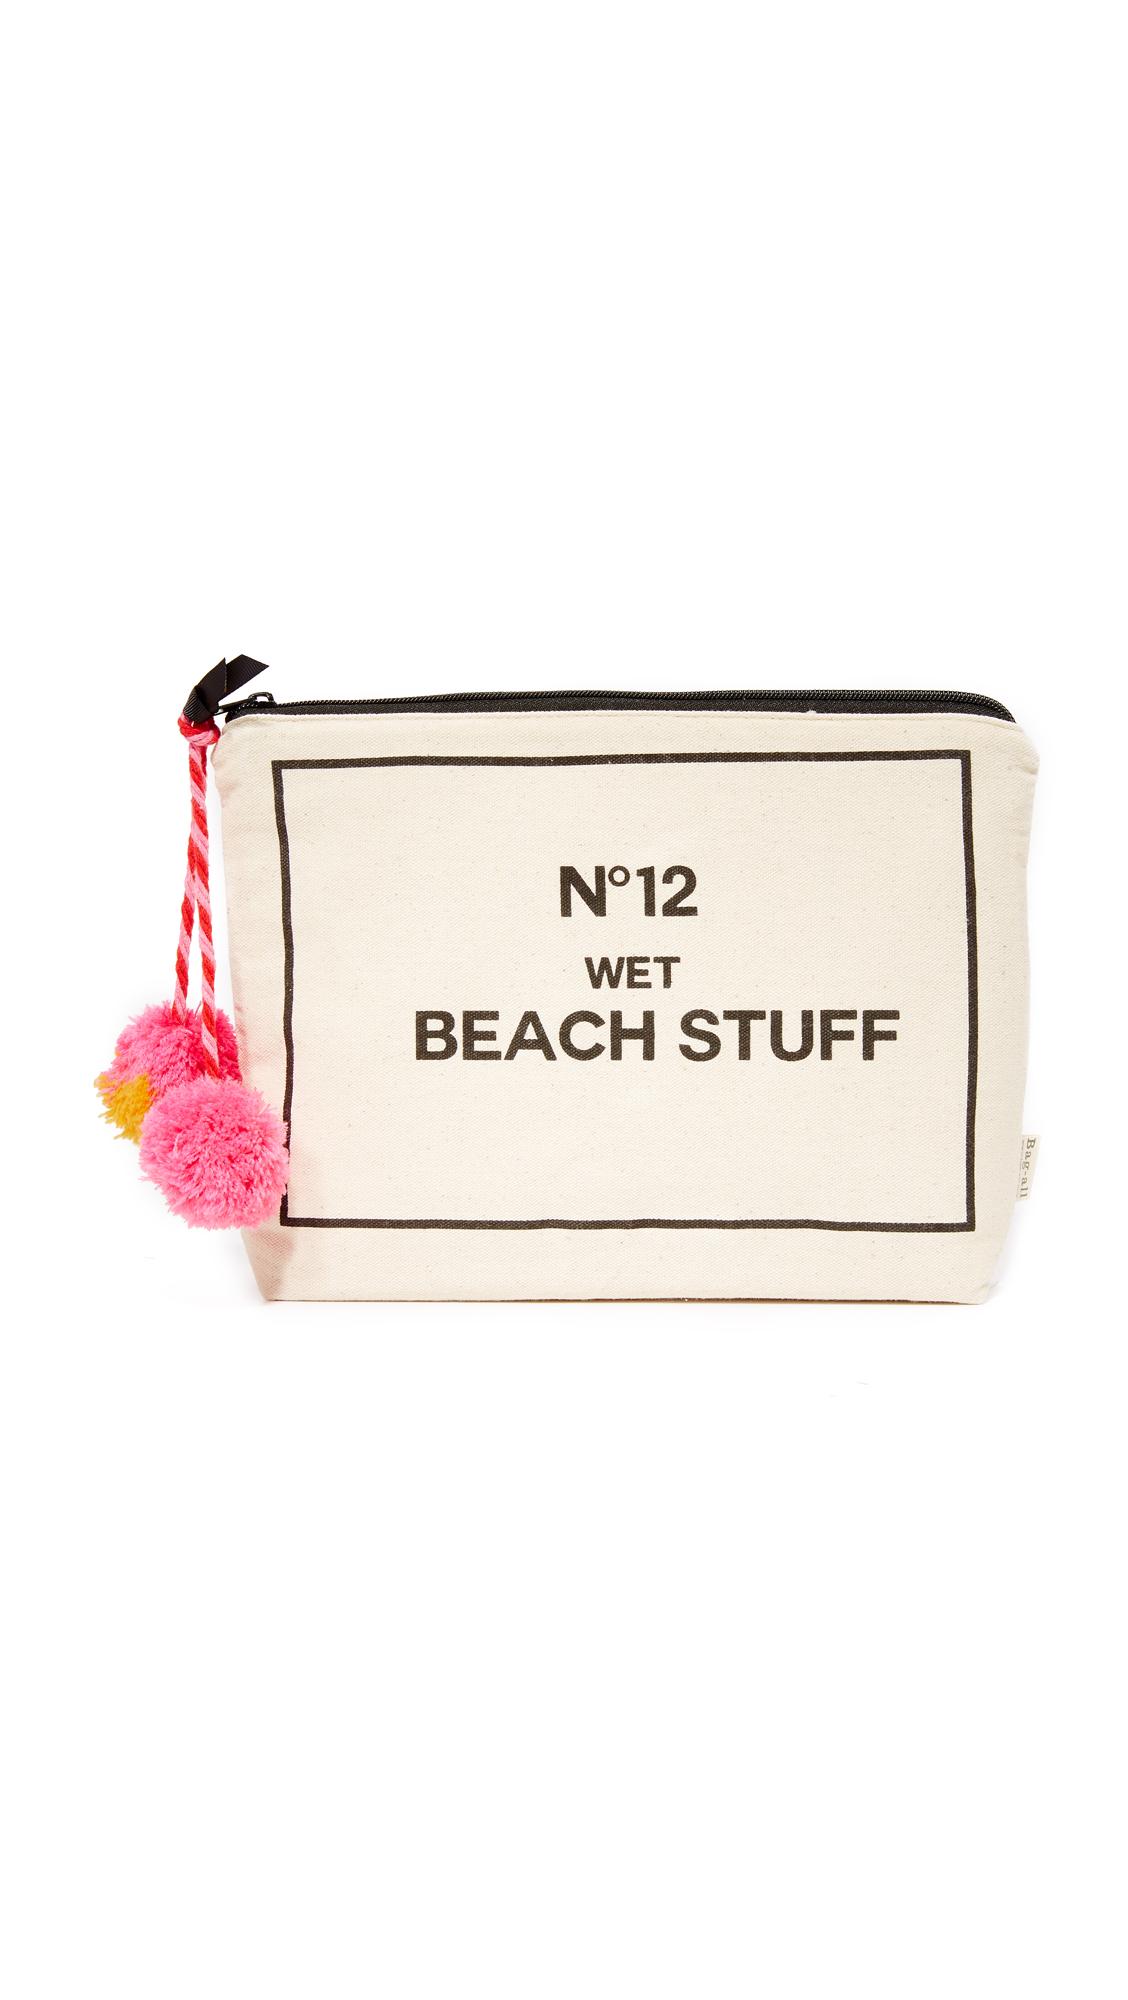 Bag-all Beach Stuff Bag - Natural/Black